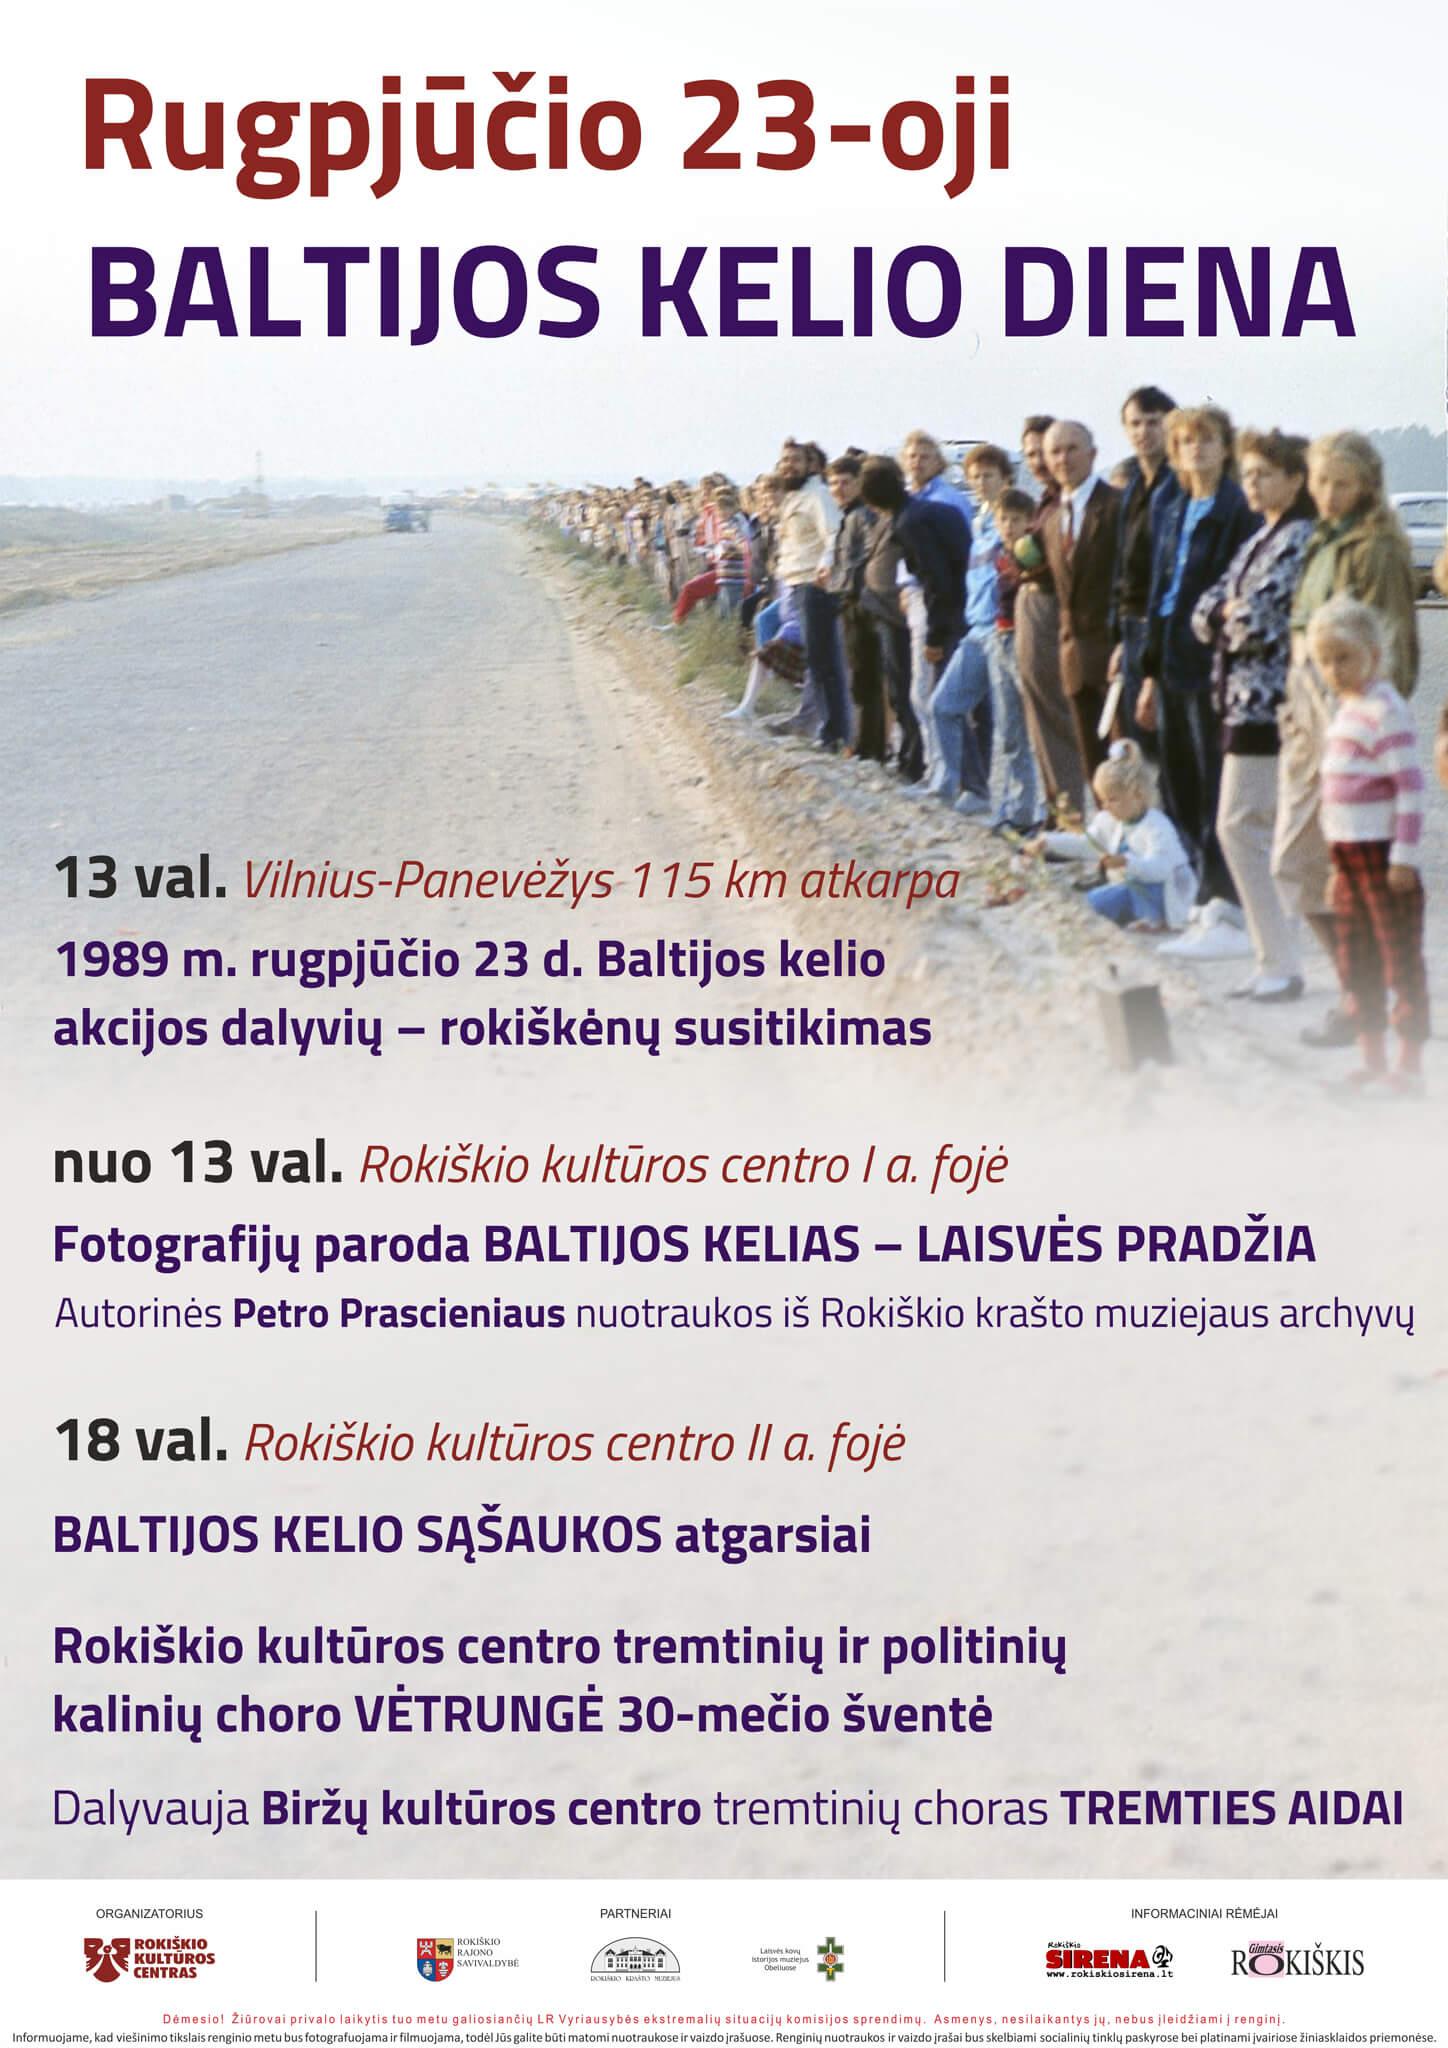 Rugpūčio 23-oji – Baltijos kelio diena